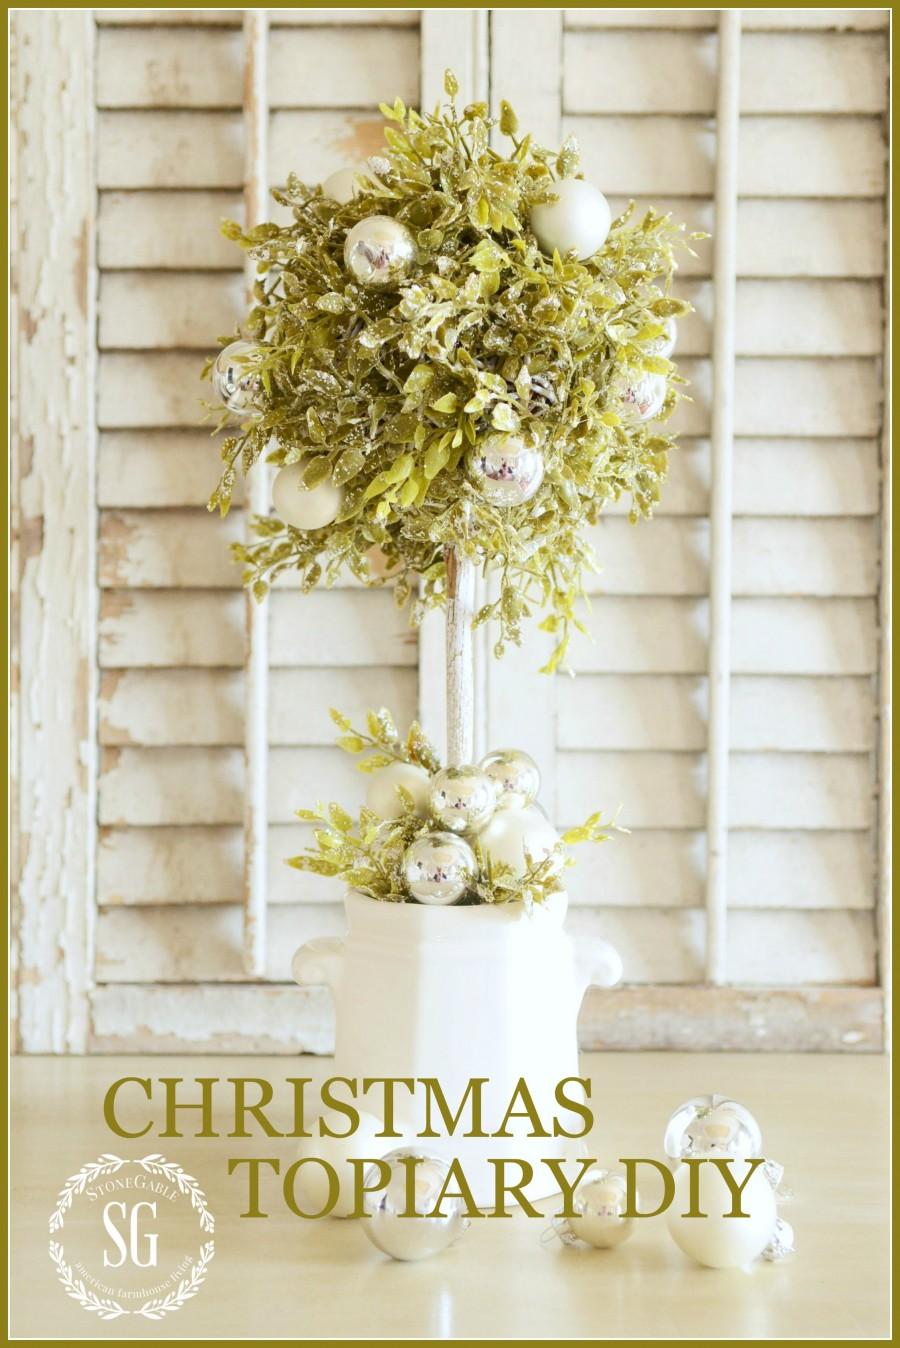 CHRISTMAS TOPIARY DIY